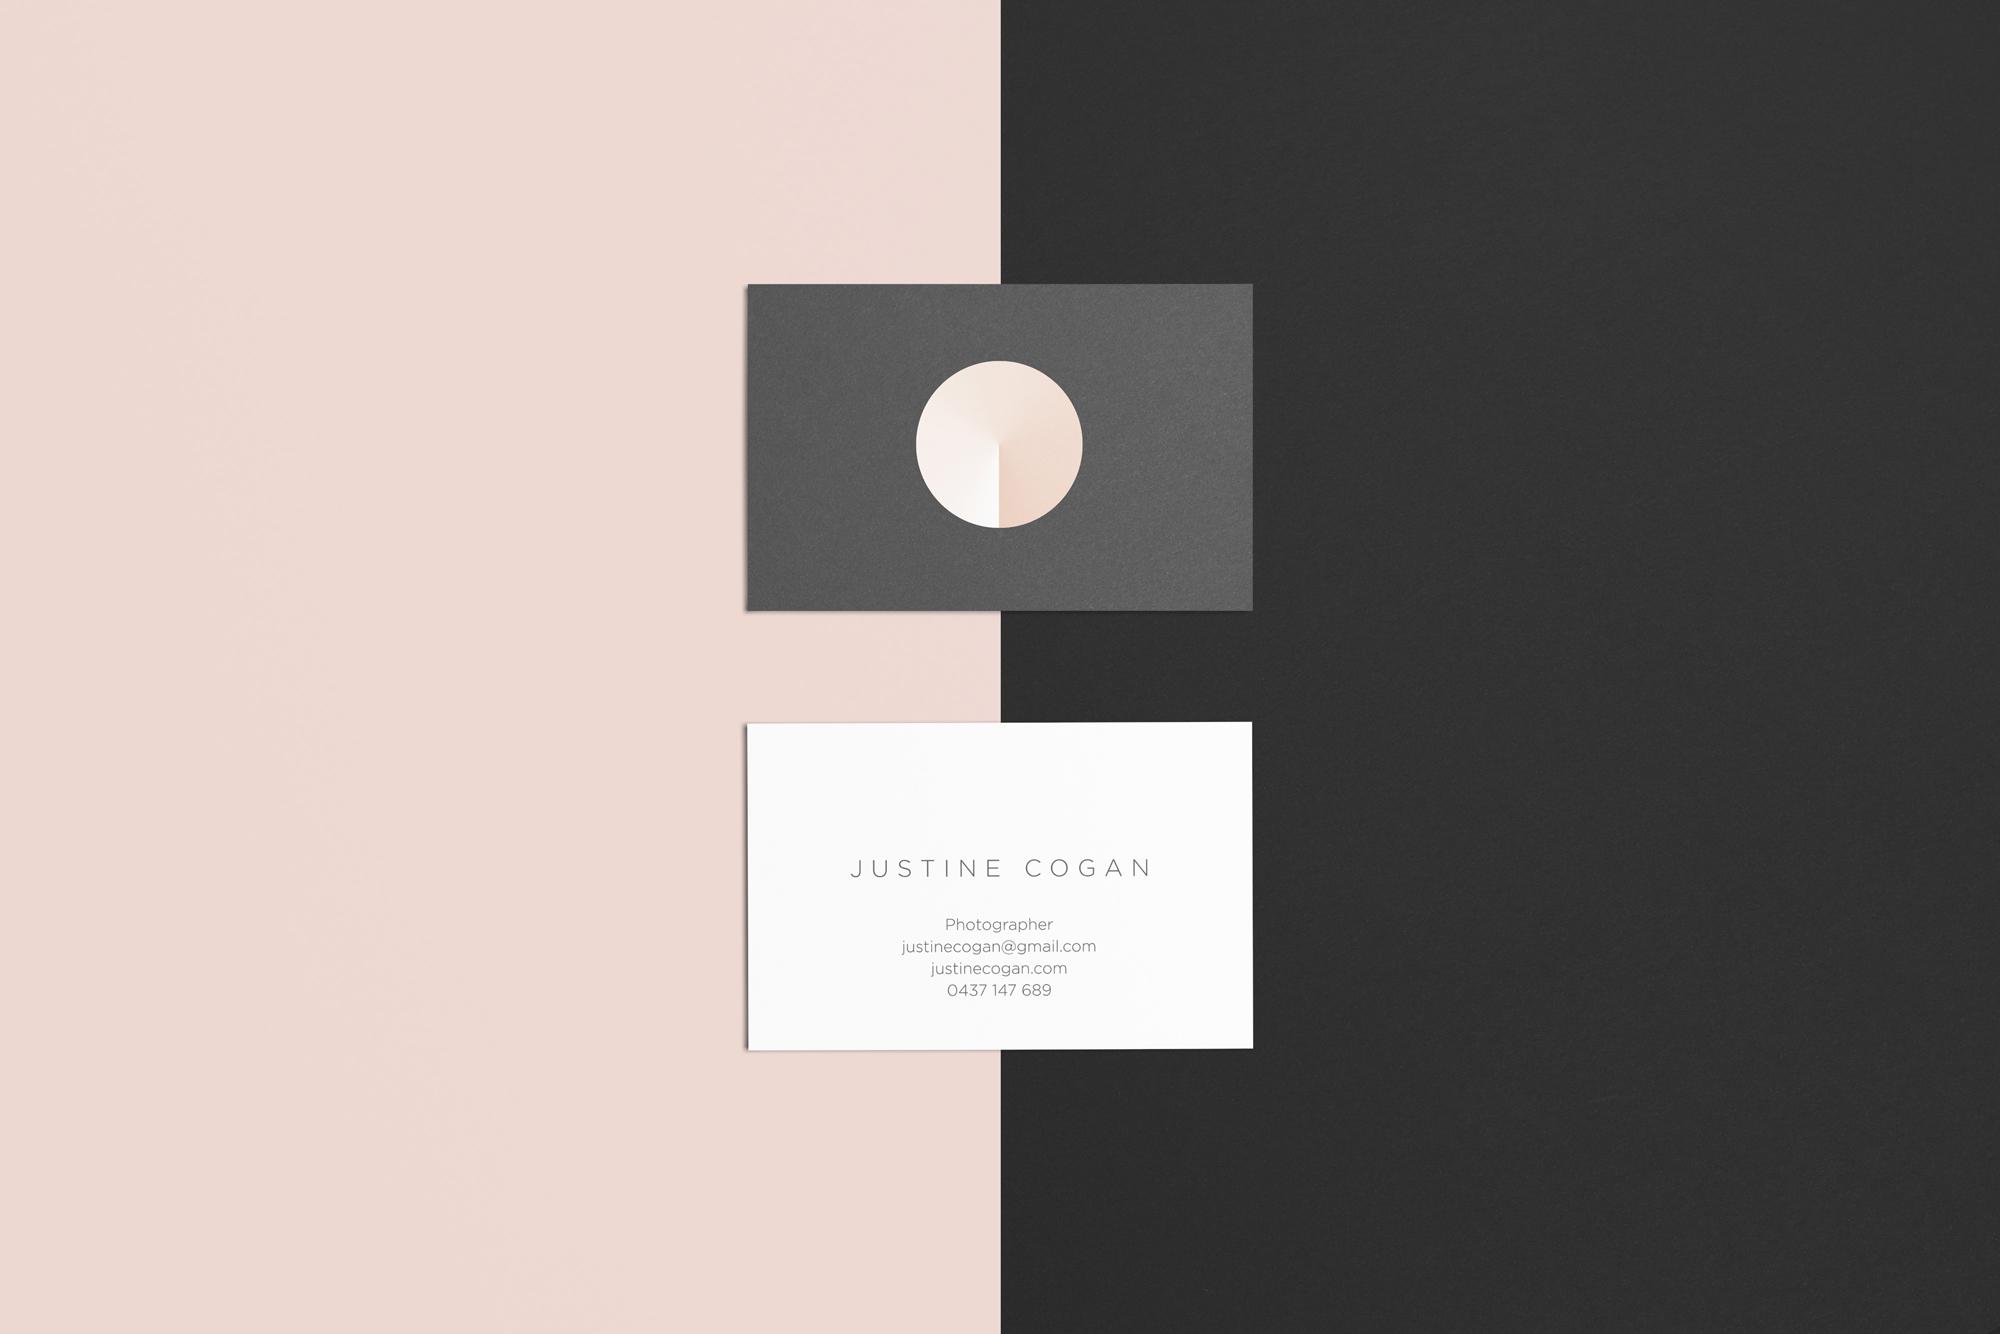 Brandon-McIntosh-Justine-Cogan-HiRes-6.jpg